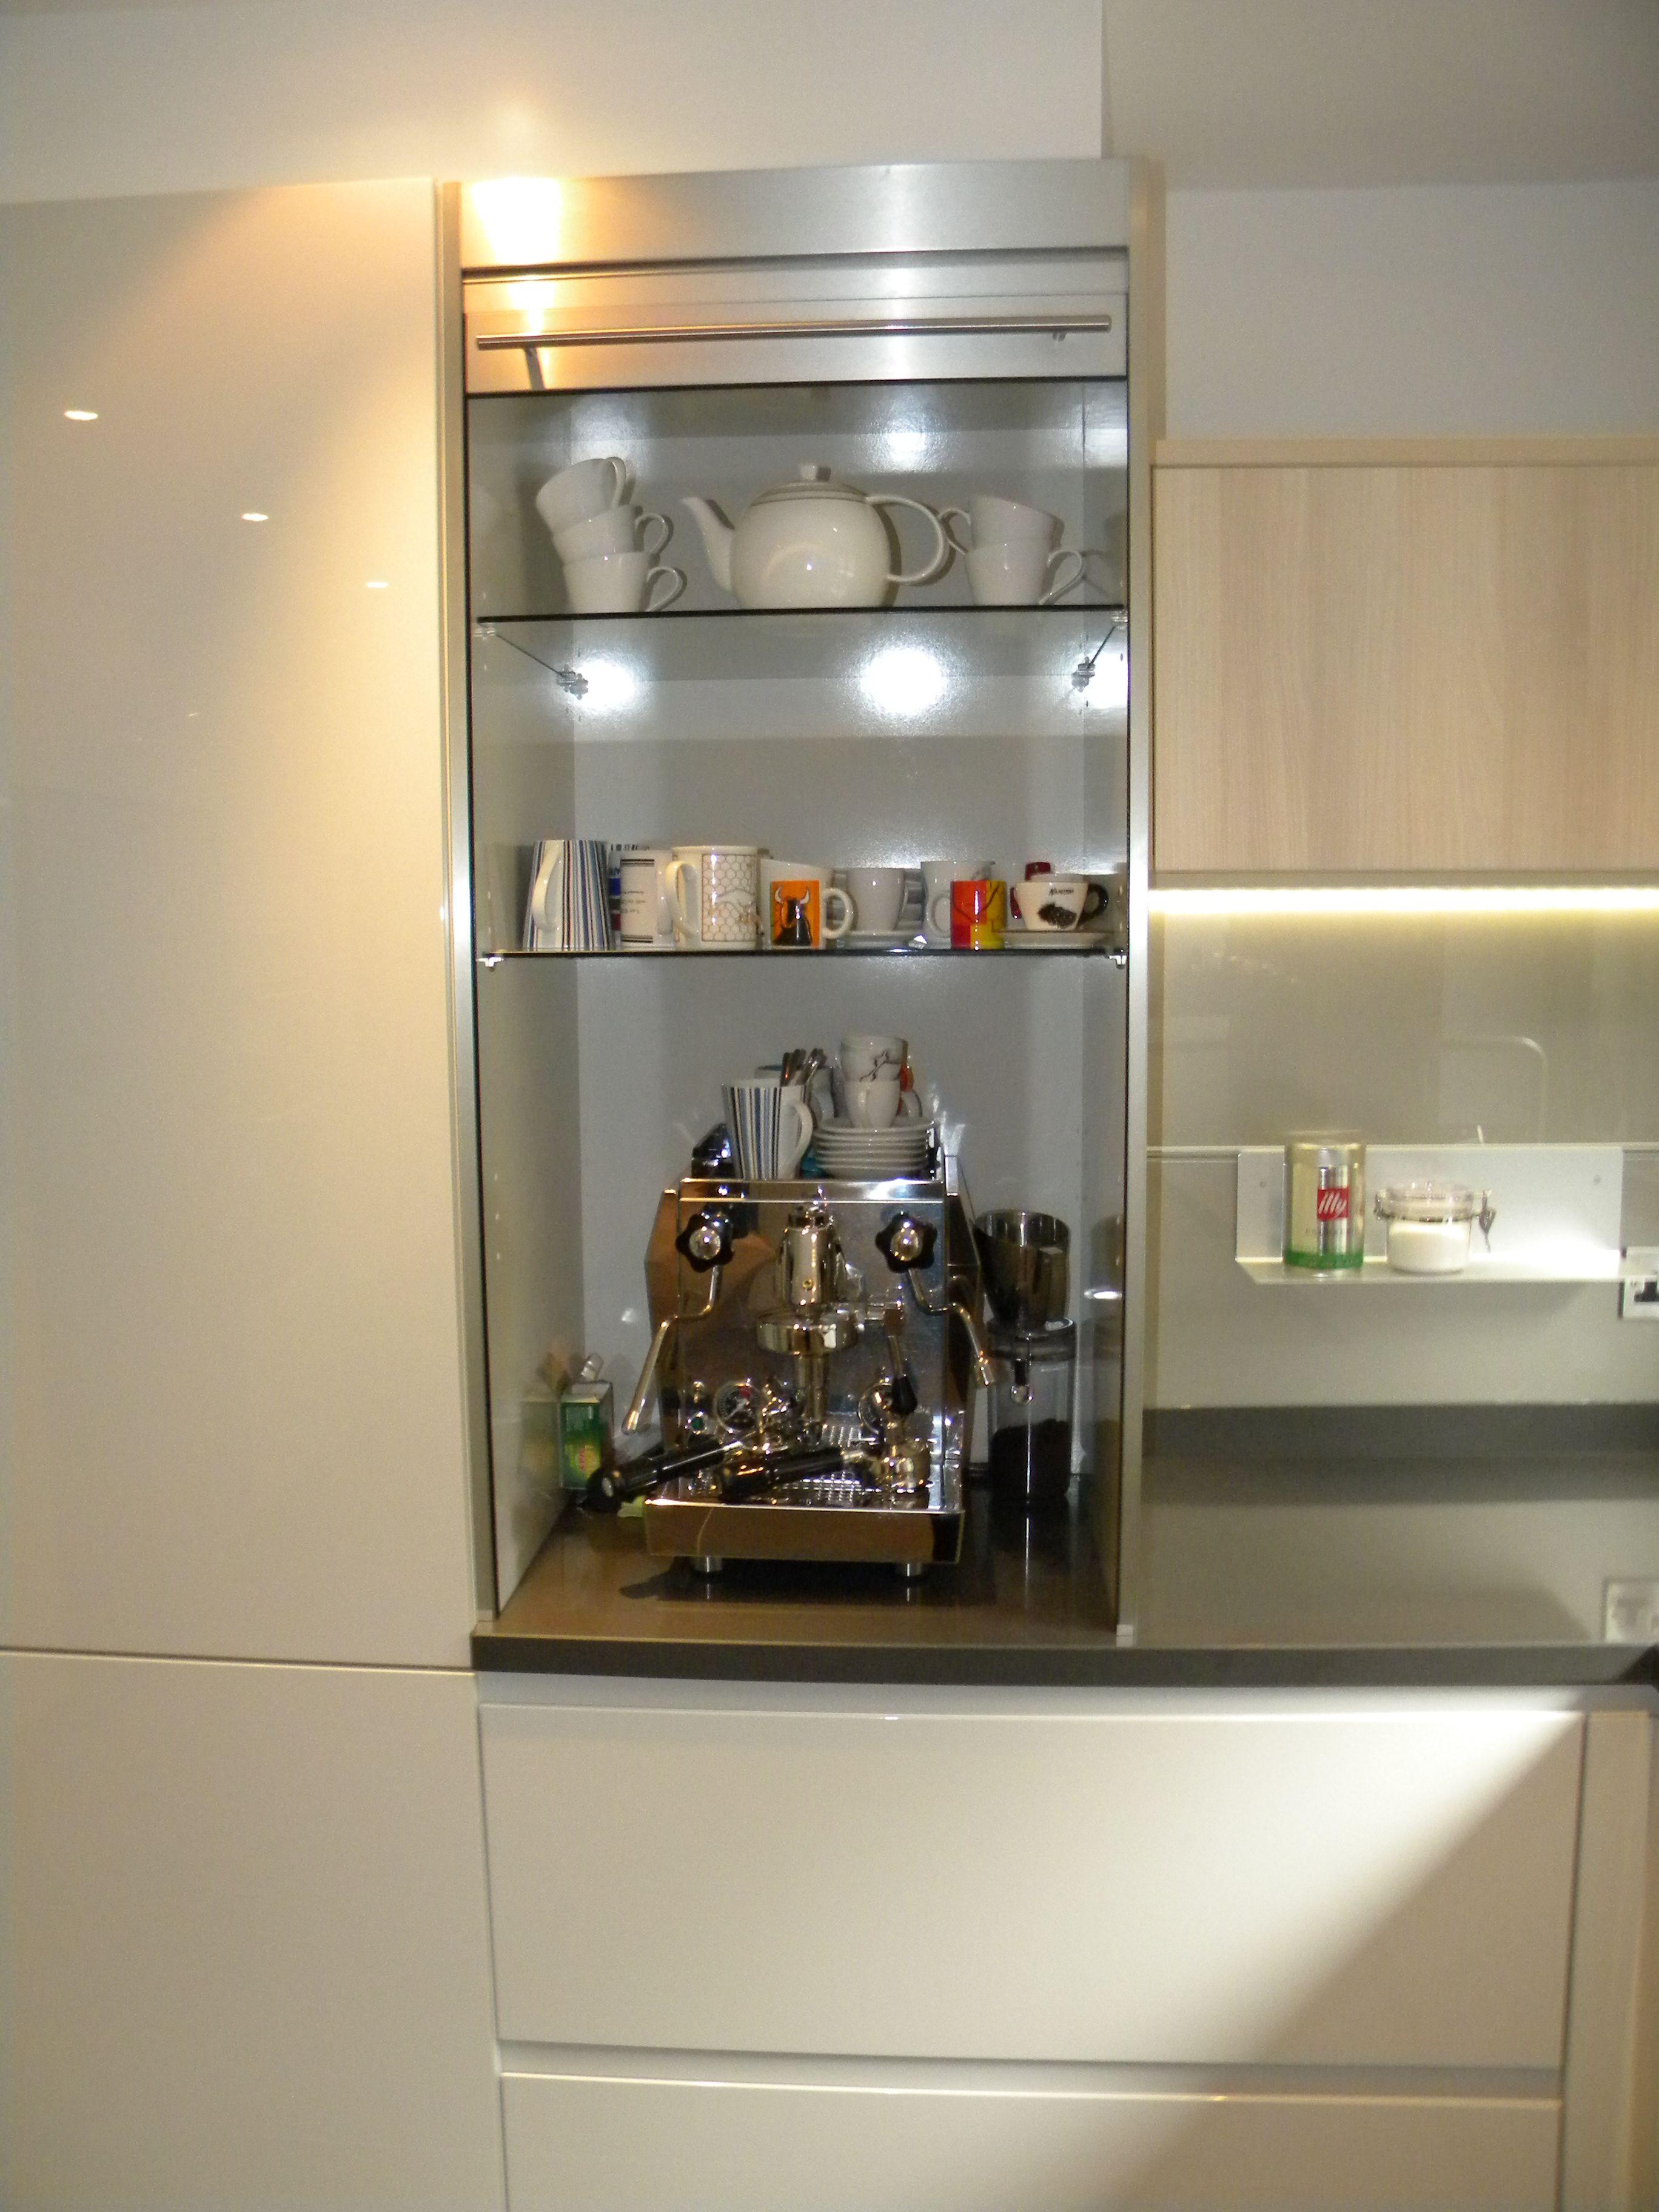 Stainless Steel Roller Shutter With Adjustable Glass Shelves Concealing Coffee Machine German Kitchen Glass Shelves Modern Kitchen